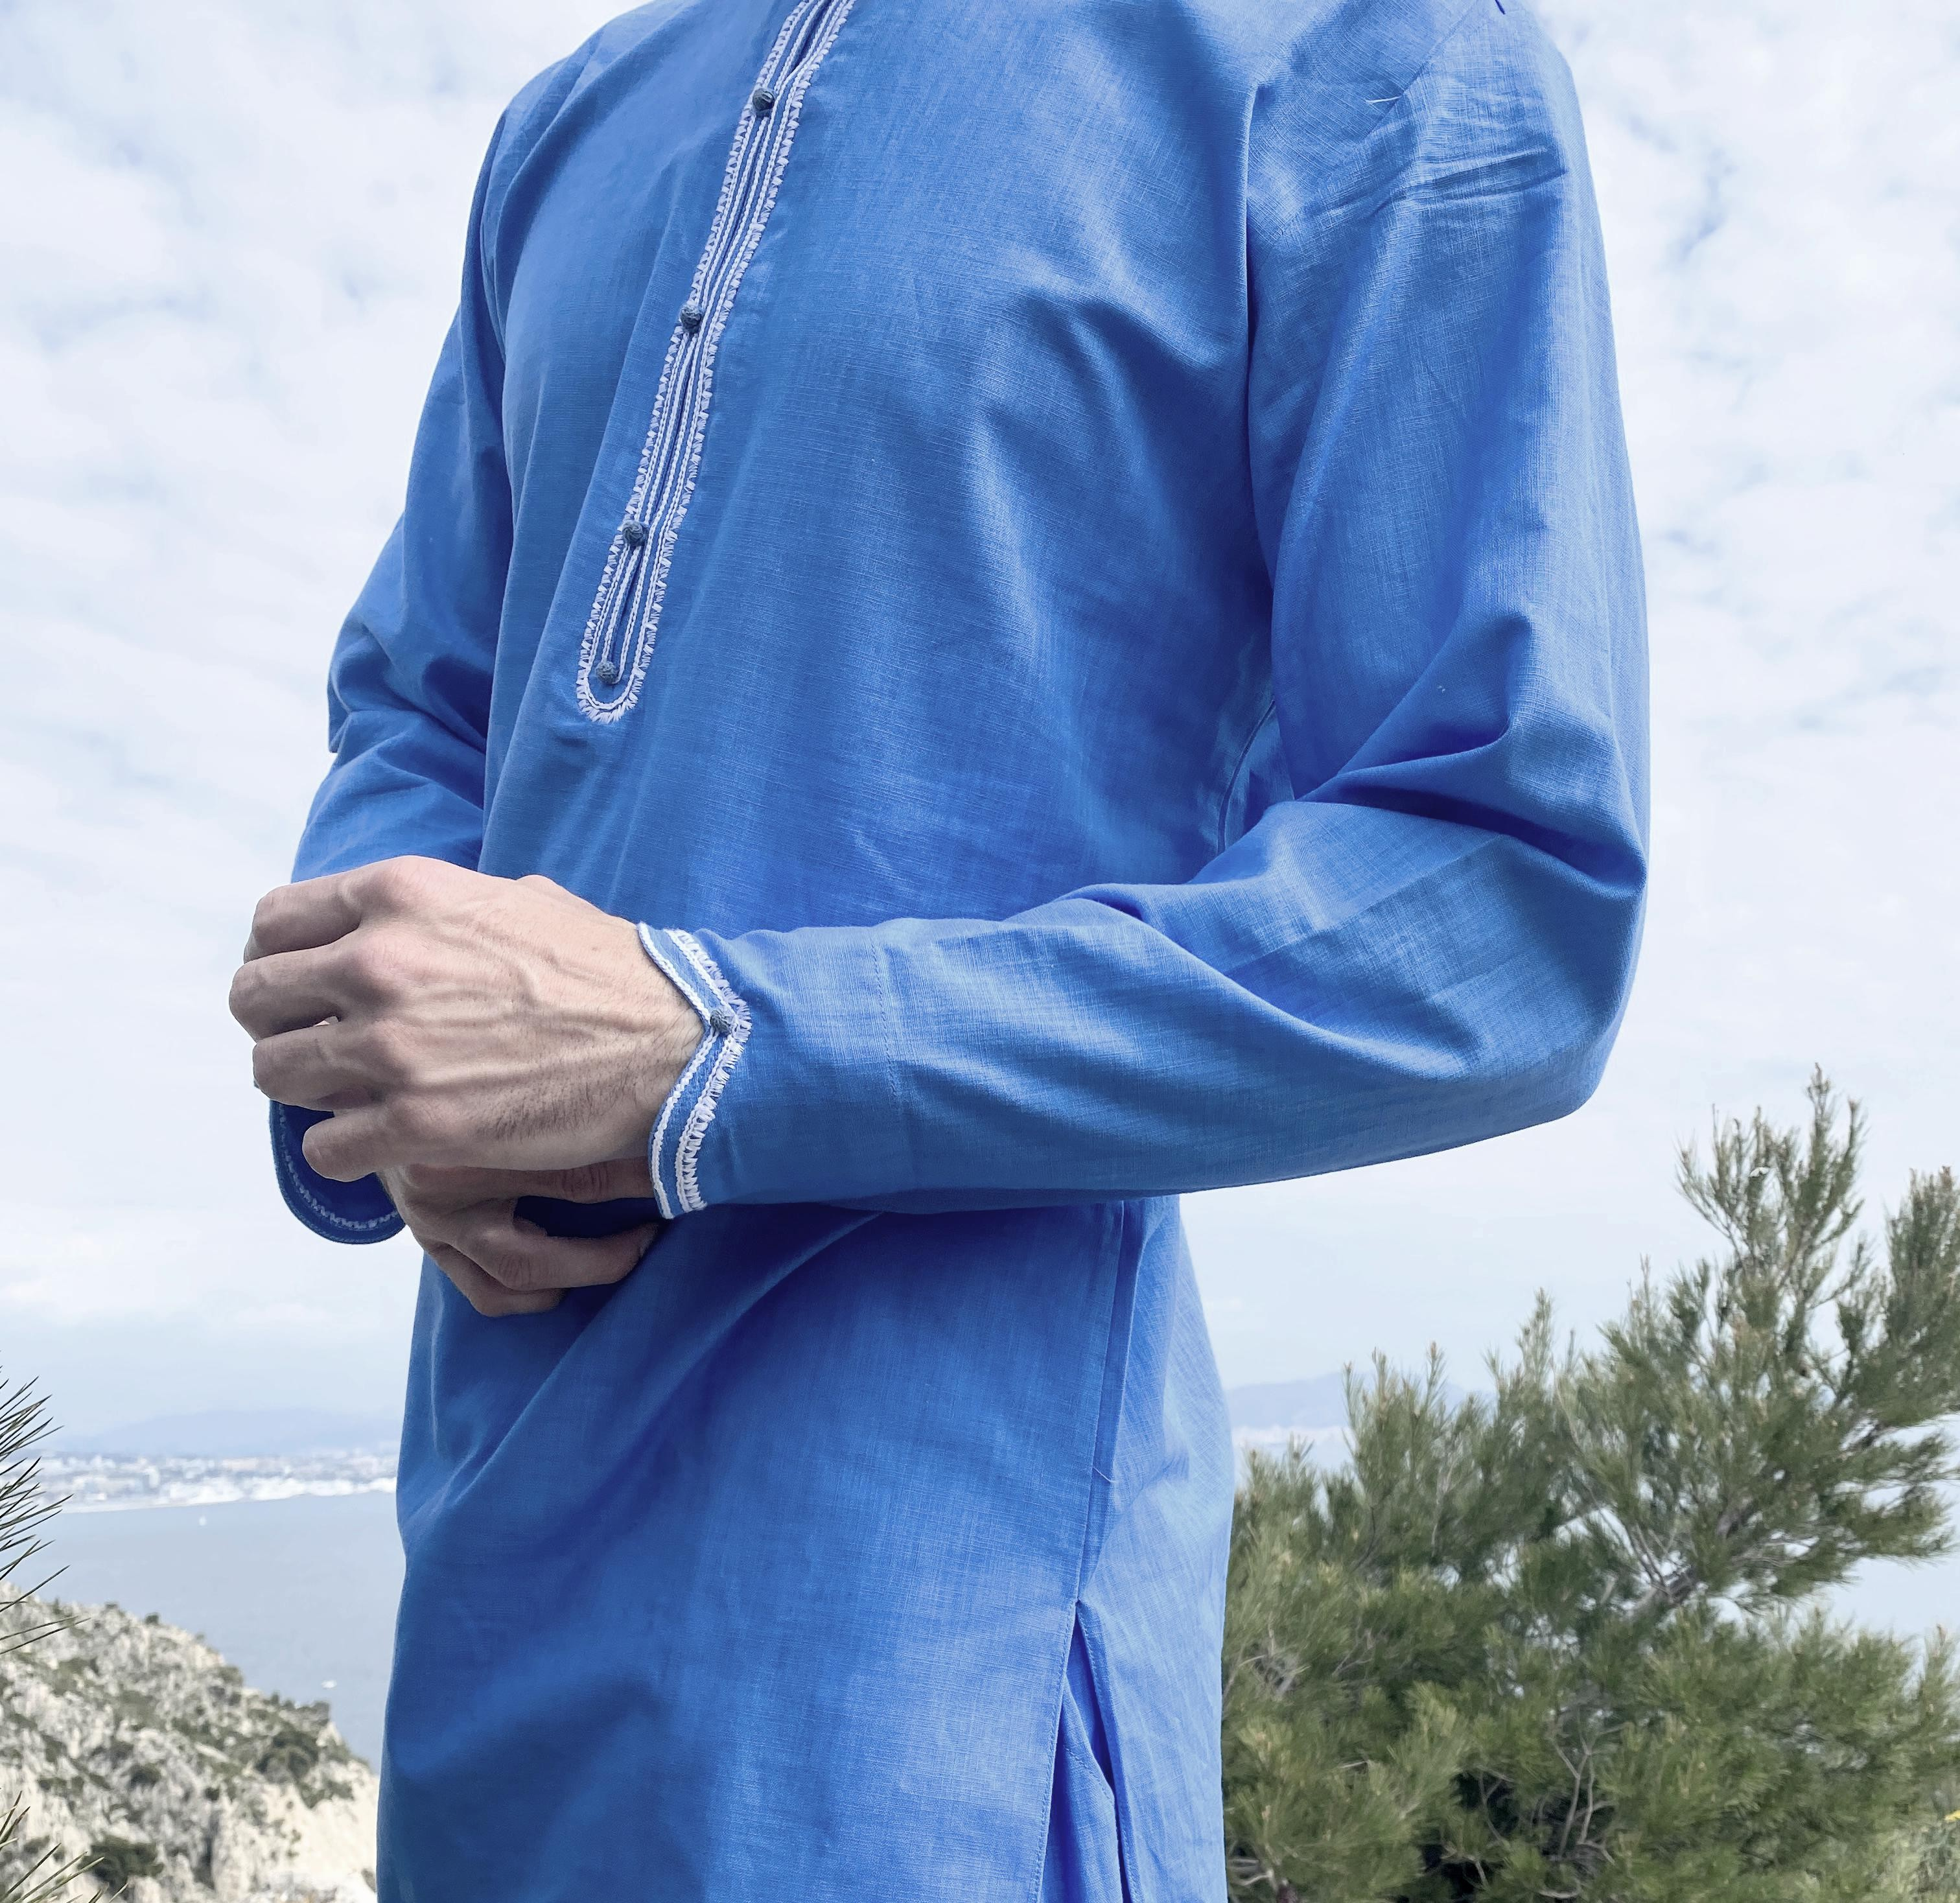 Qamis Al Masaf tunic cut fabric Linen : Sapphire blue with Qandrissi Serwel (Moroccan Style)